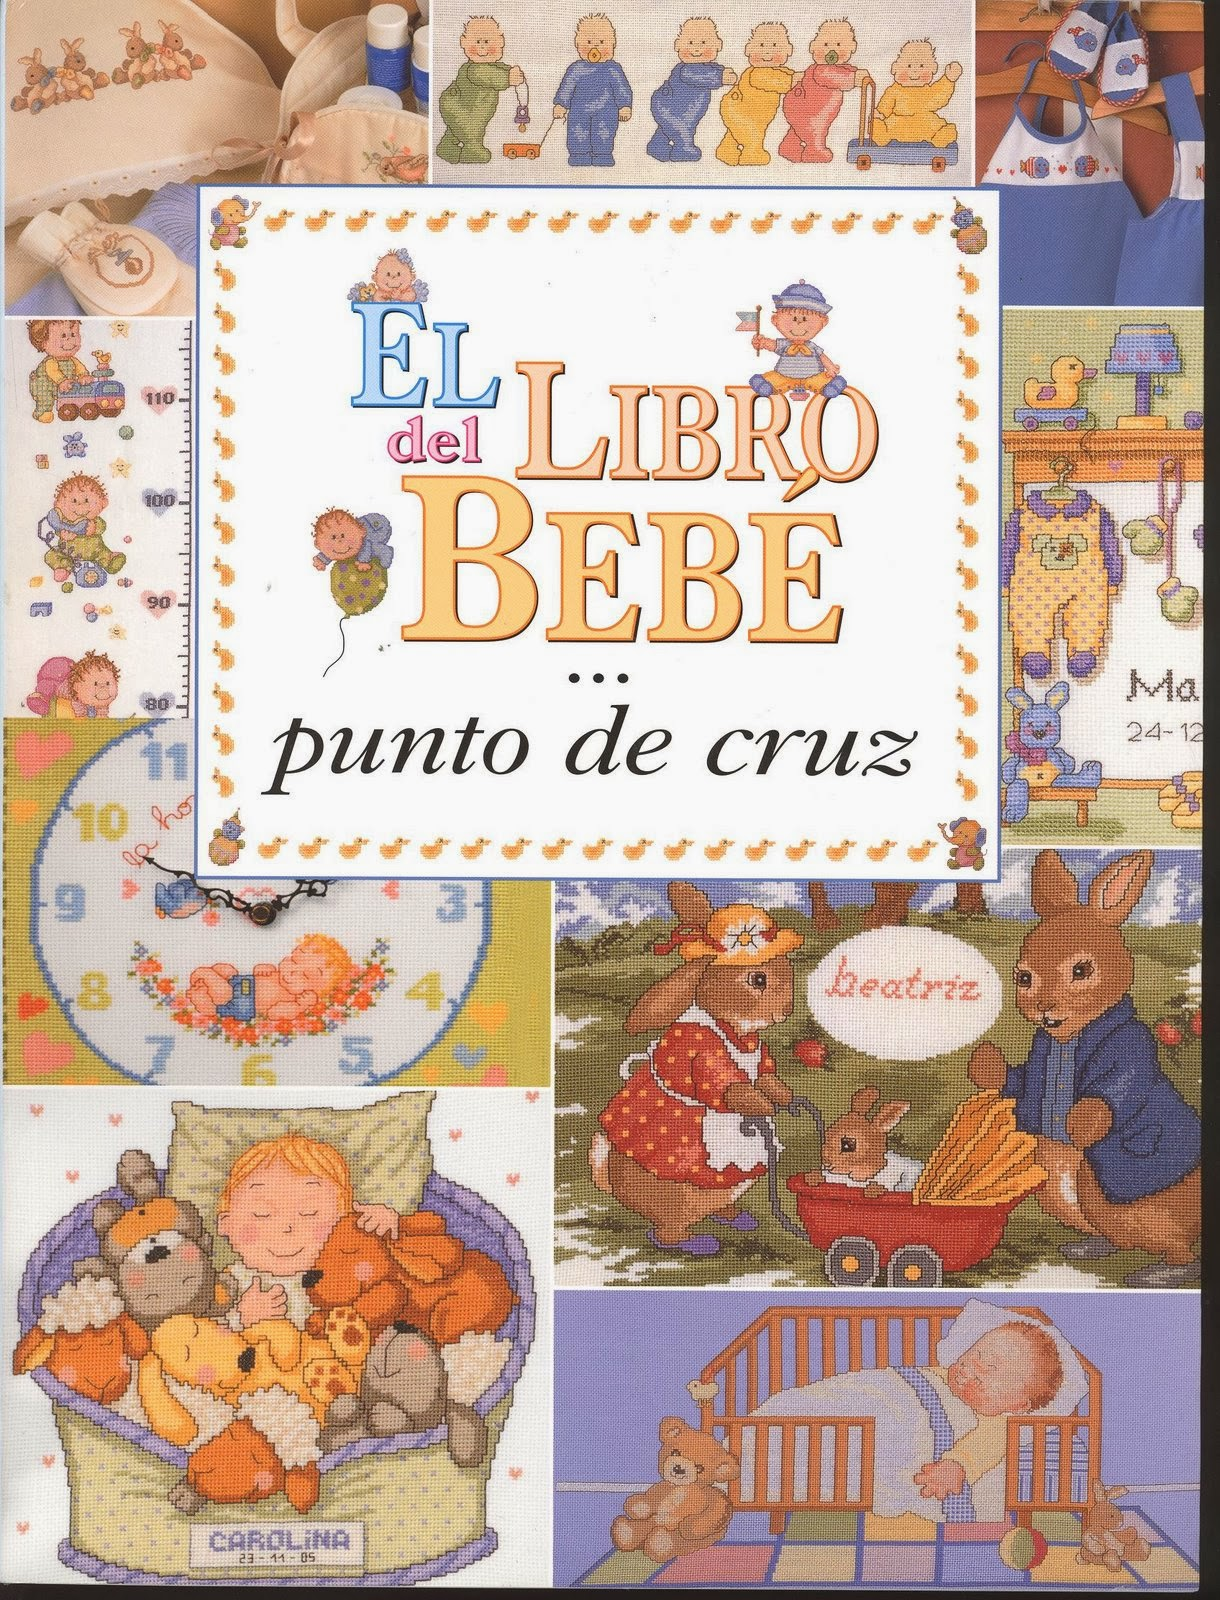 Punto de cruz bebes revistas de manualidades gratis for Revistas de decoracion gratis